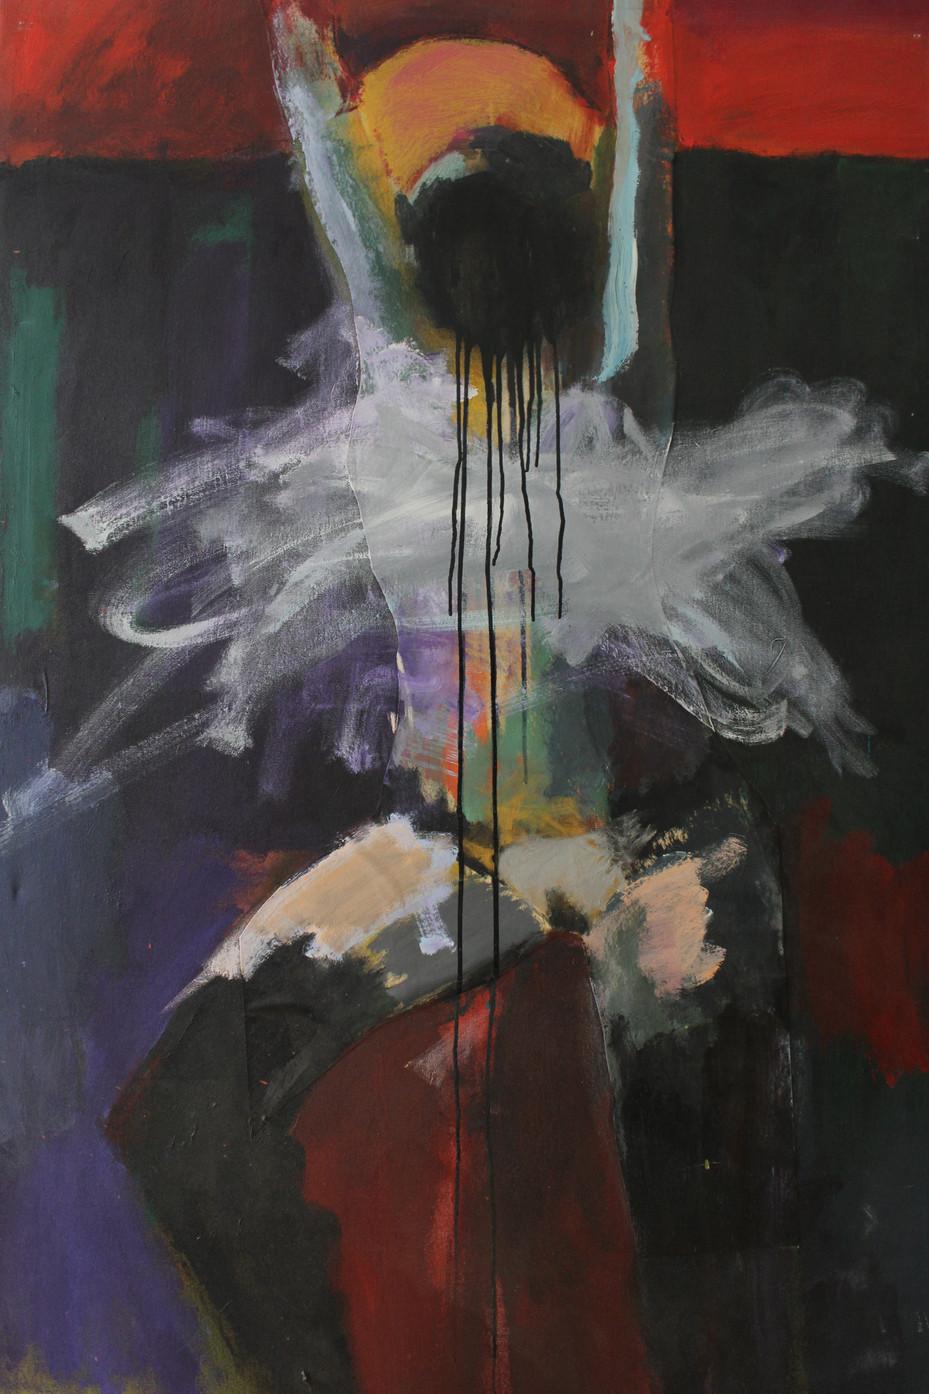 150×80cm / Mixed Media on Canvas / 2014